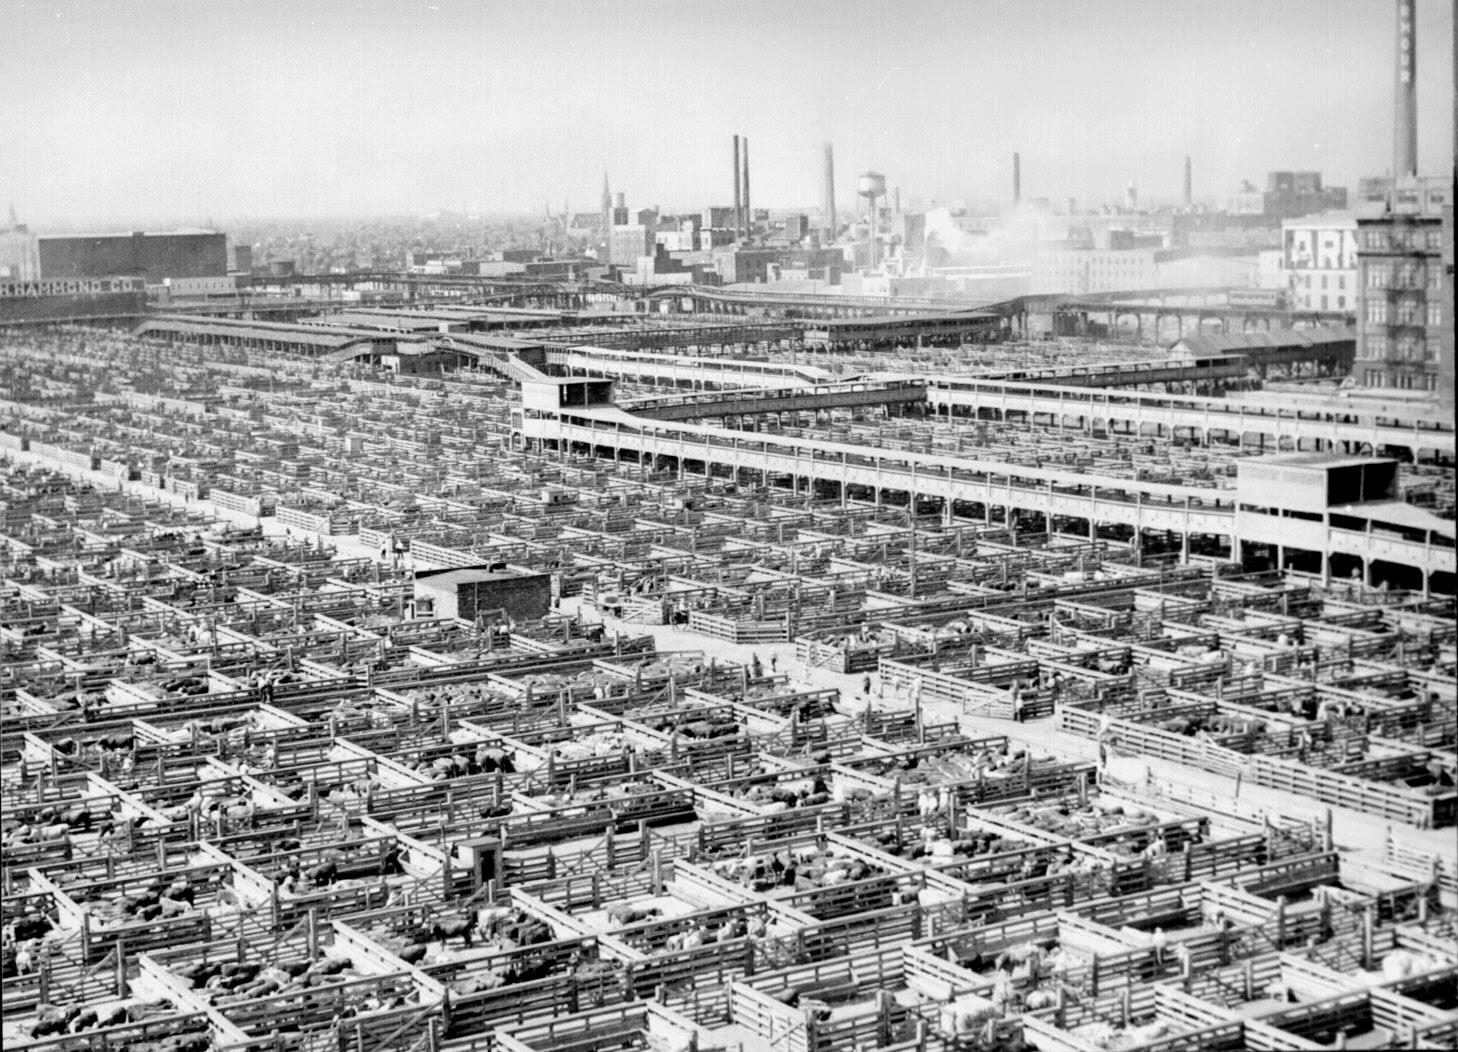 http://upload.wikimedia.org/wikipedia/commons/7/71/Livestock_chicago_1947.jpg